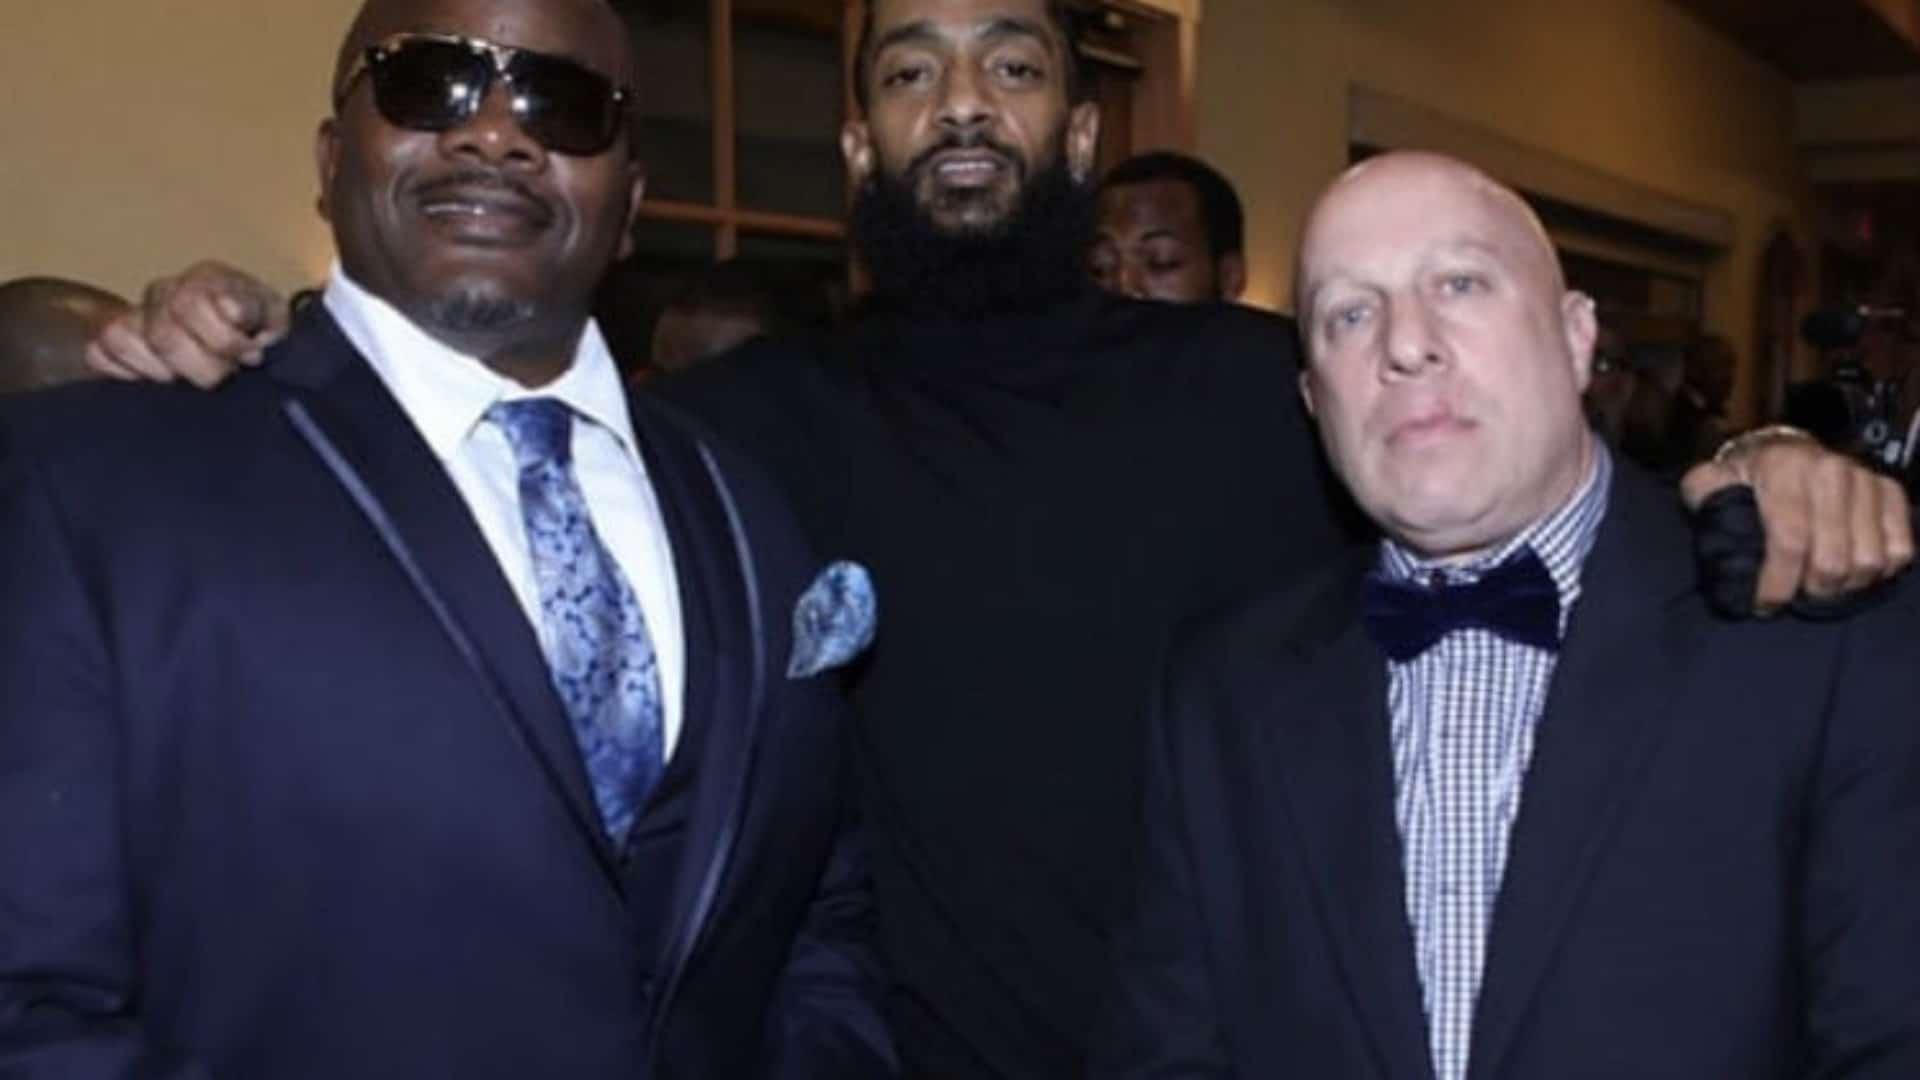 Eugene 'Big U' Henley Speaks On Uniting Gangs, Community Service And